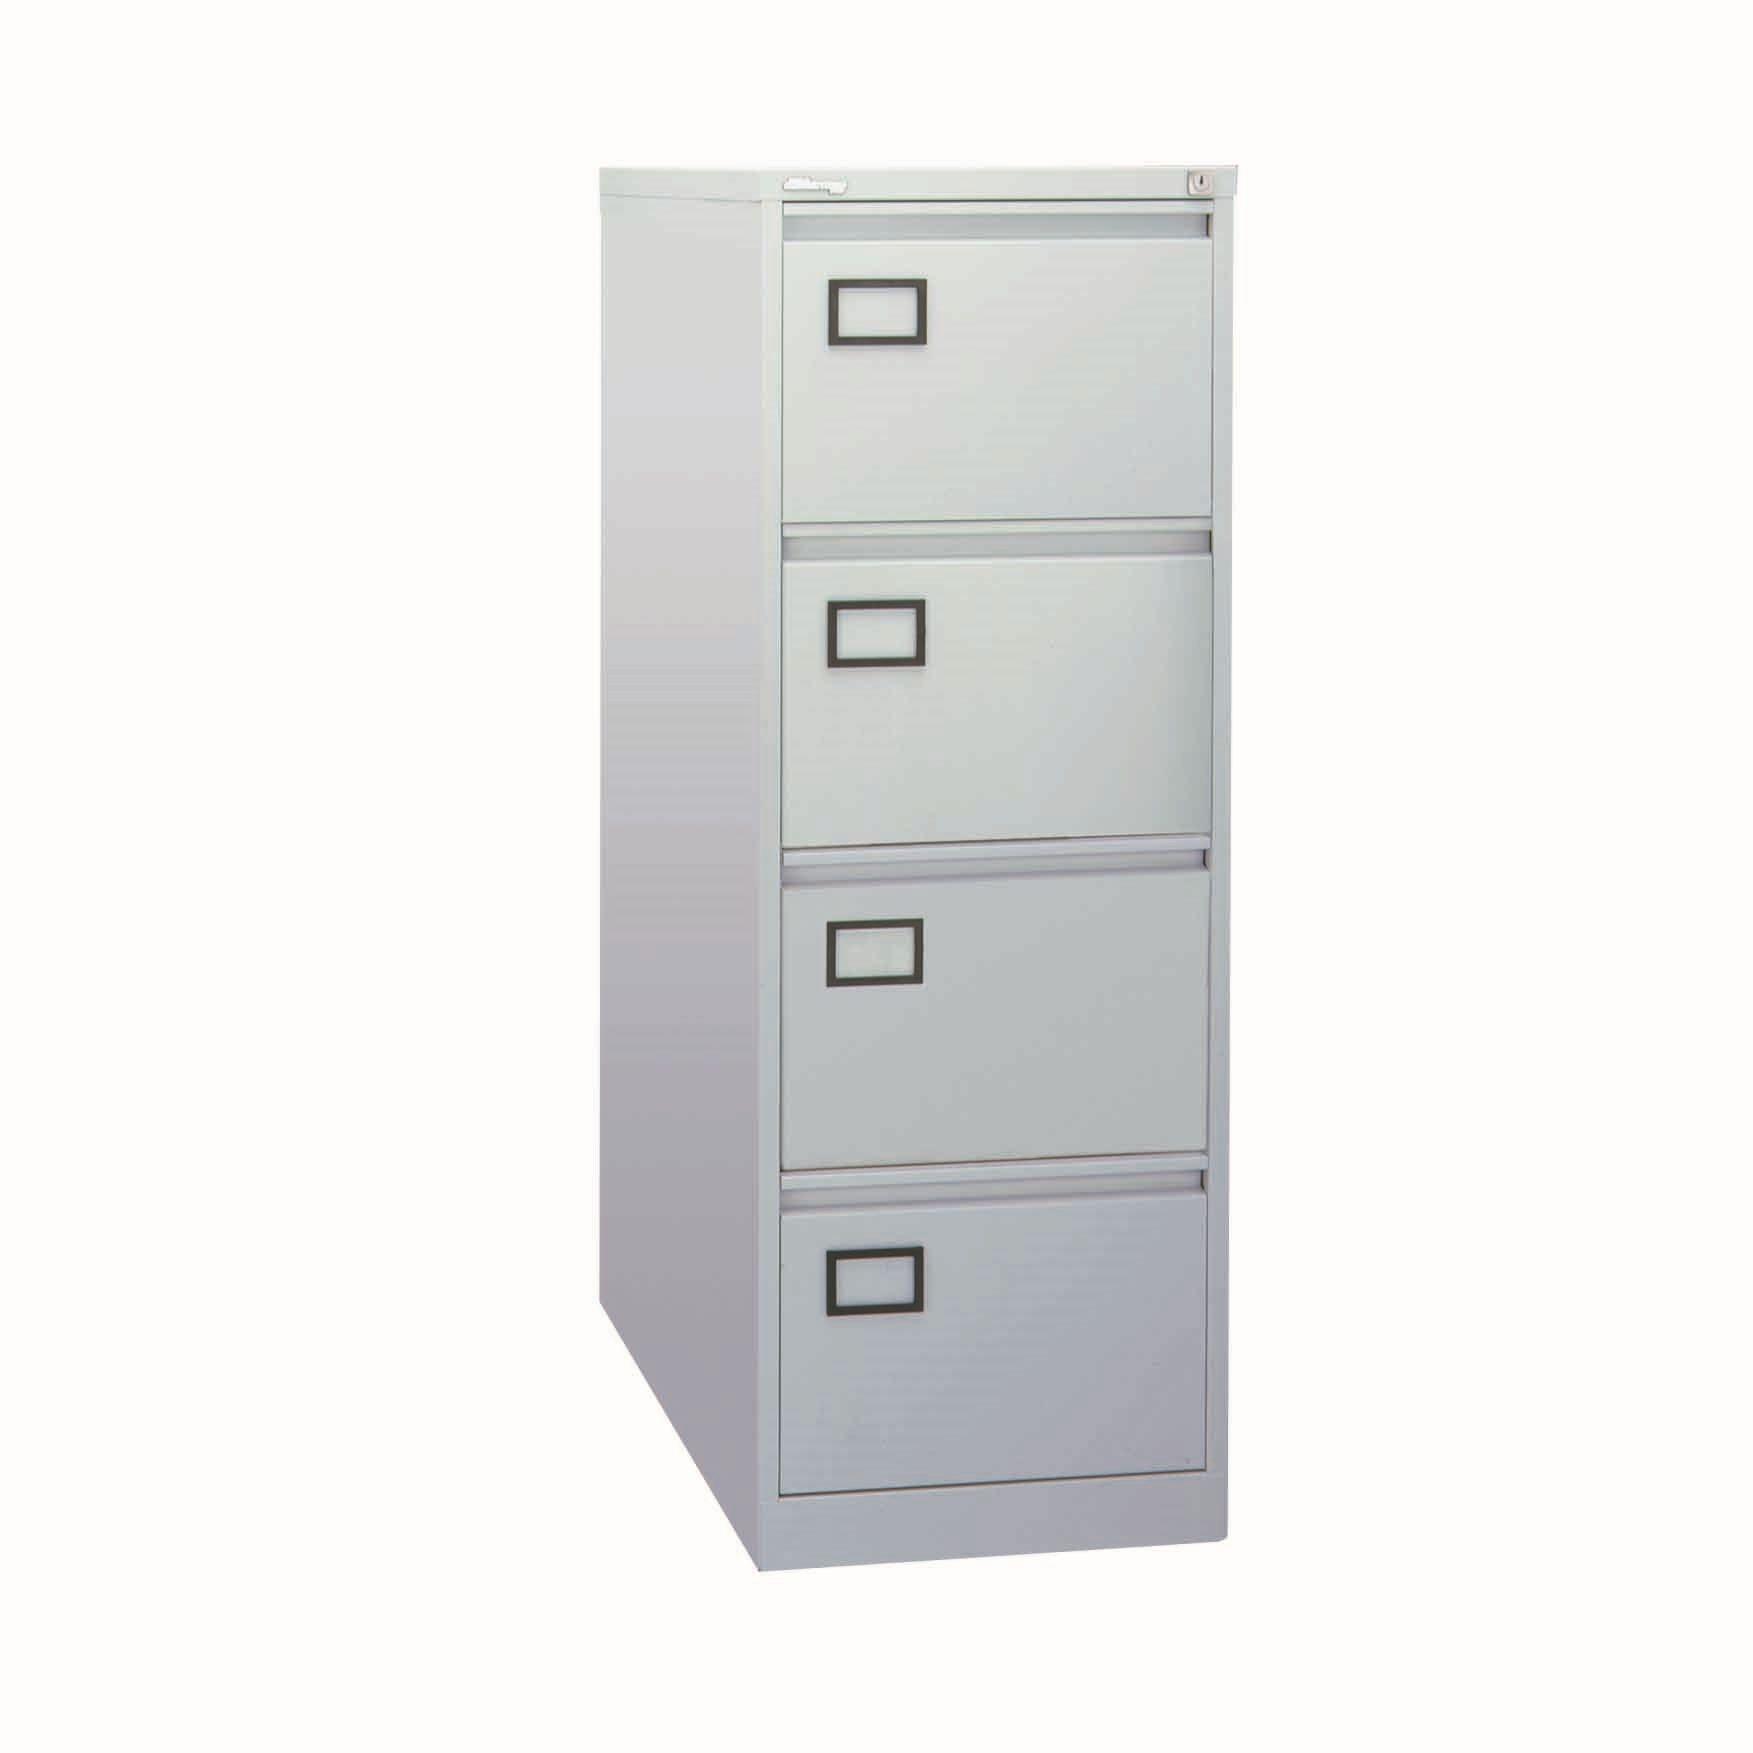 4 Drawer Filing Cabinet Lockable